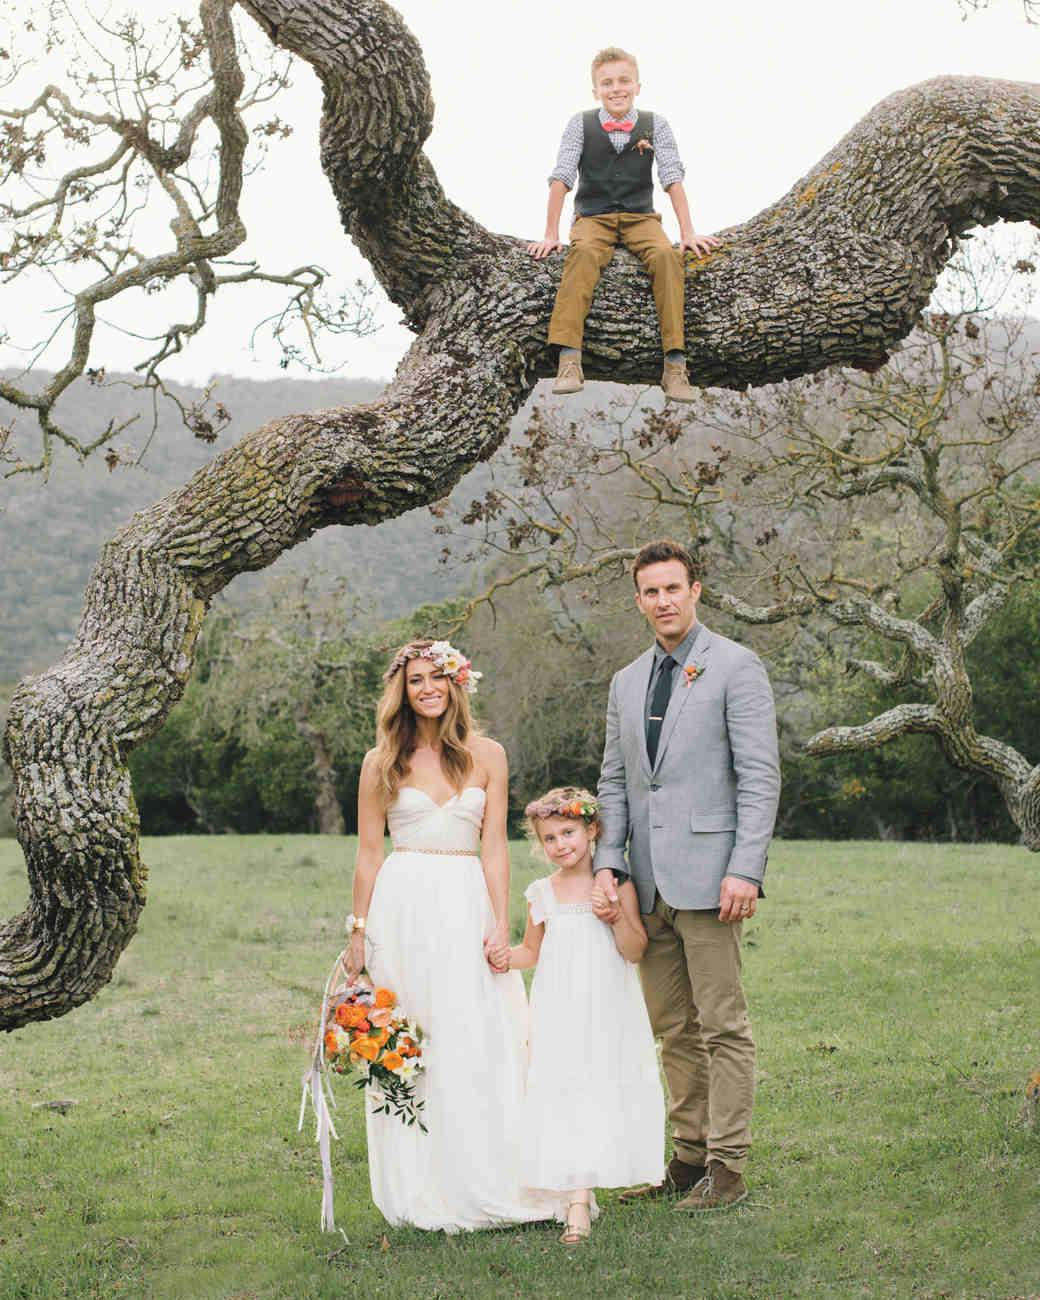 carlie-gabe-wedding-vow-renewal-247dm1-5220-s111570.jpg